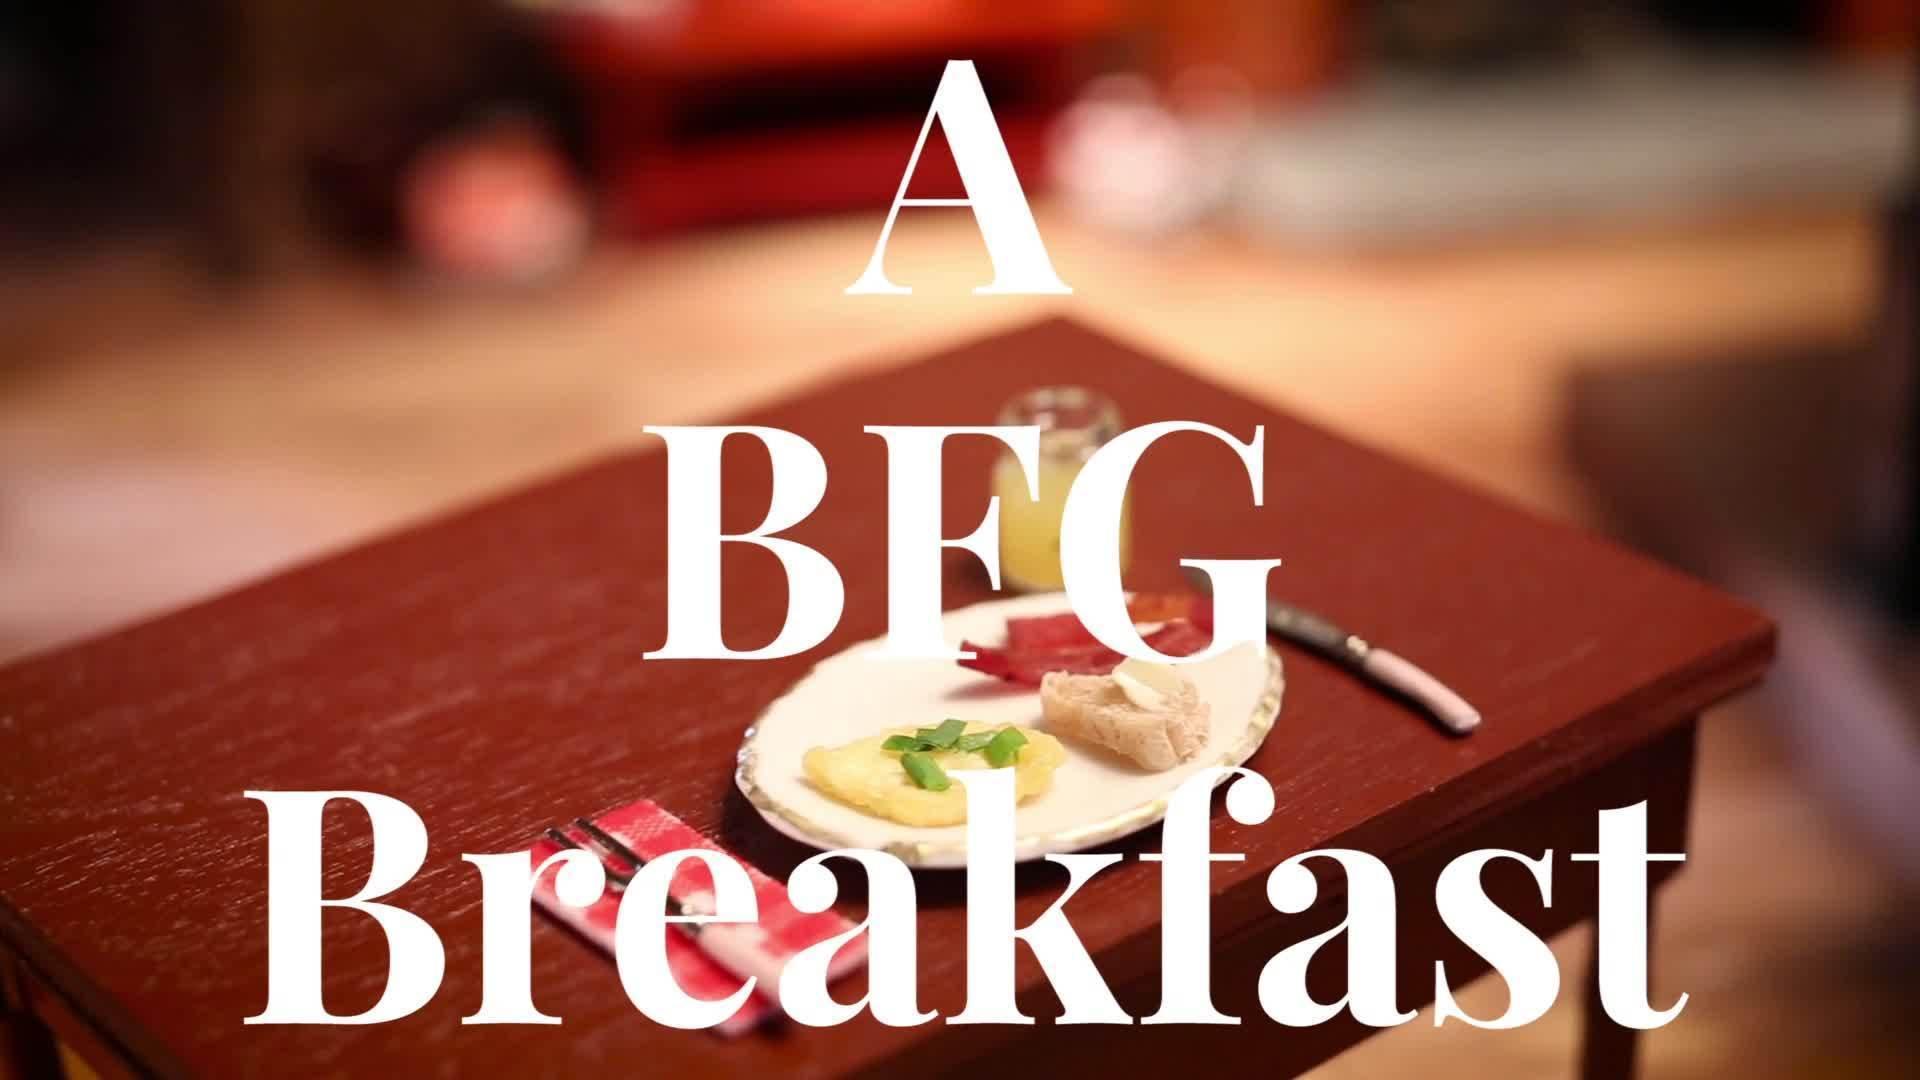 A BFG Breakfast | Dishes by Disney